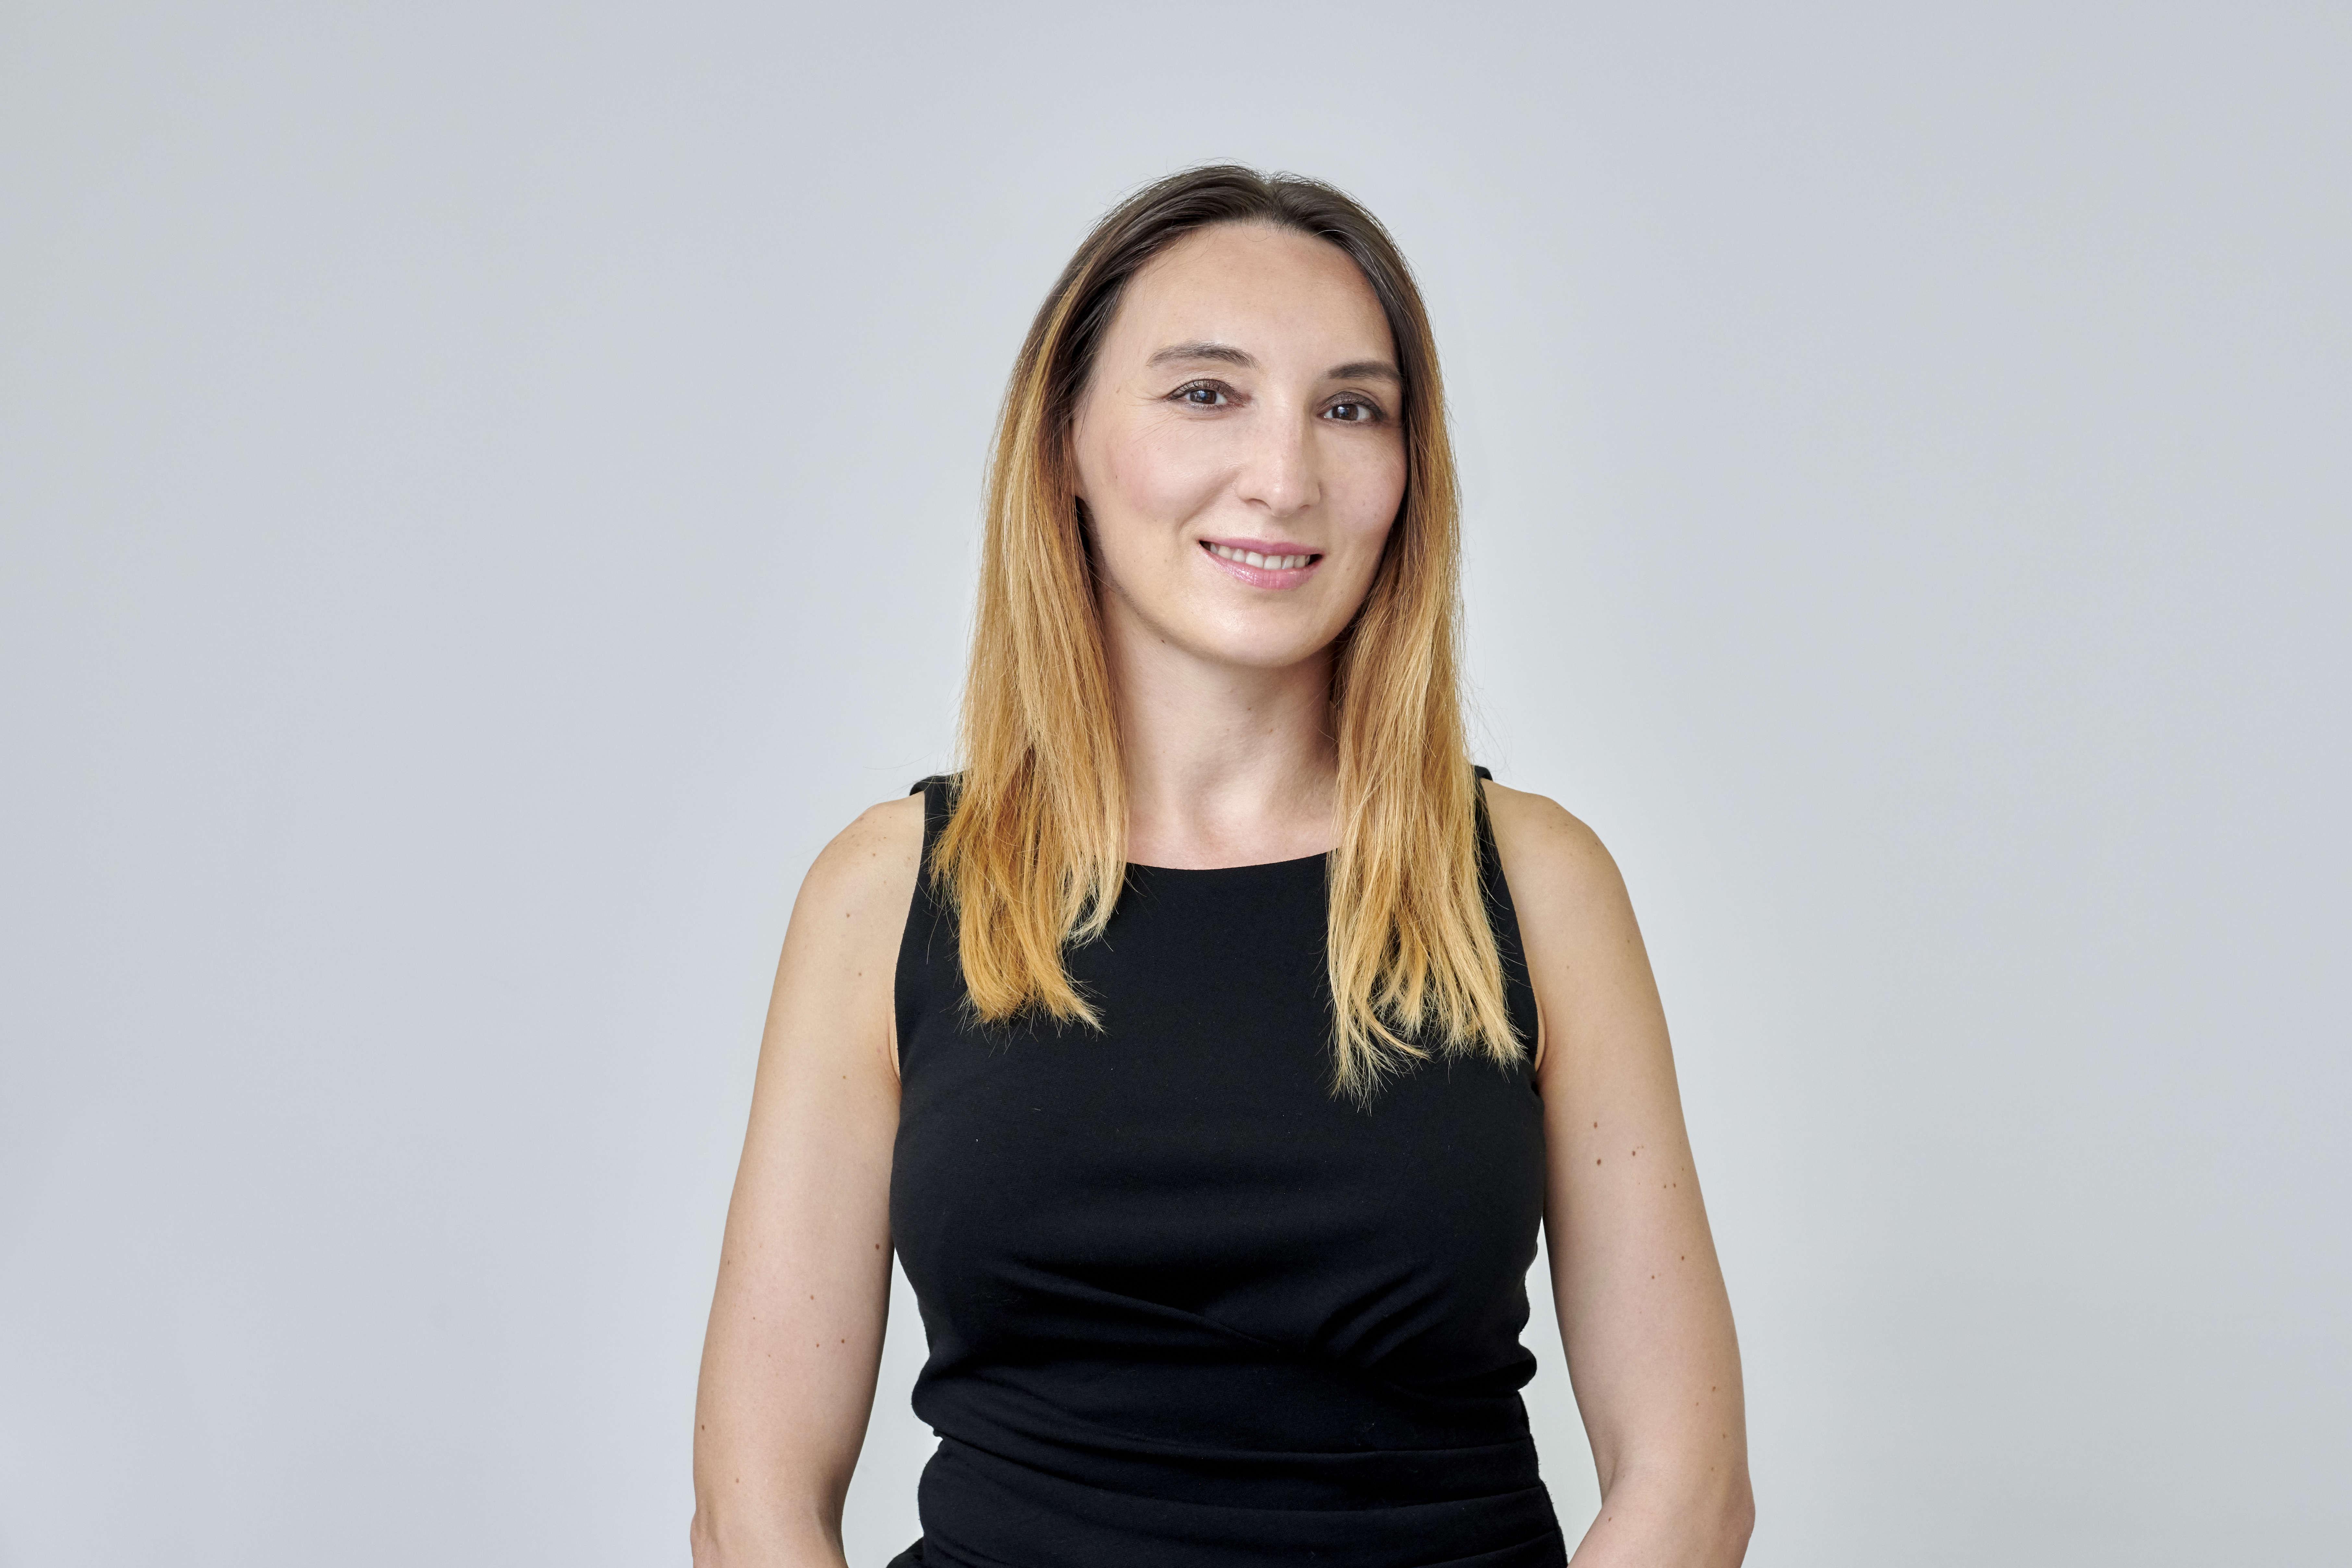 Katarzyna Ciesinska